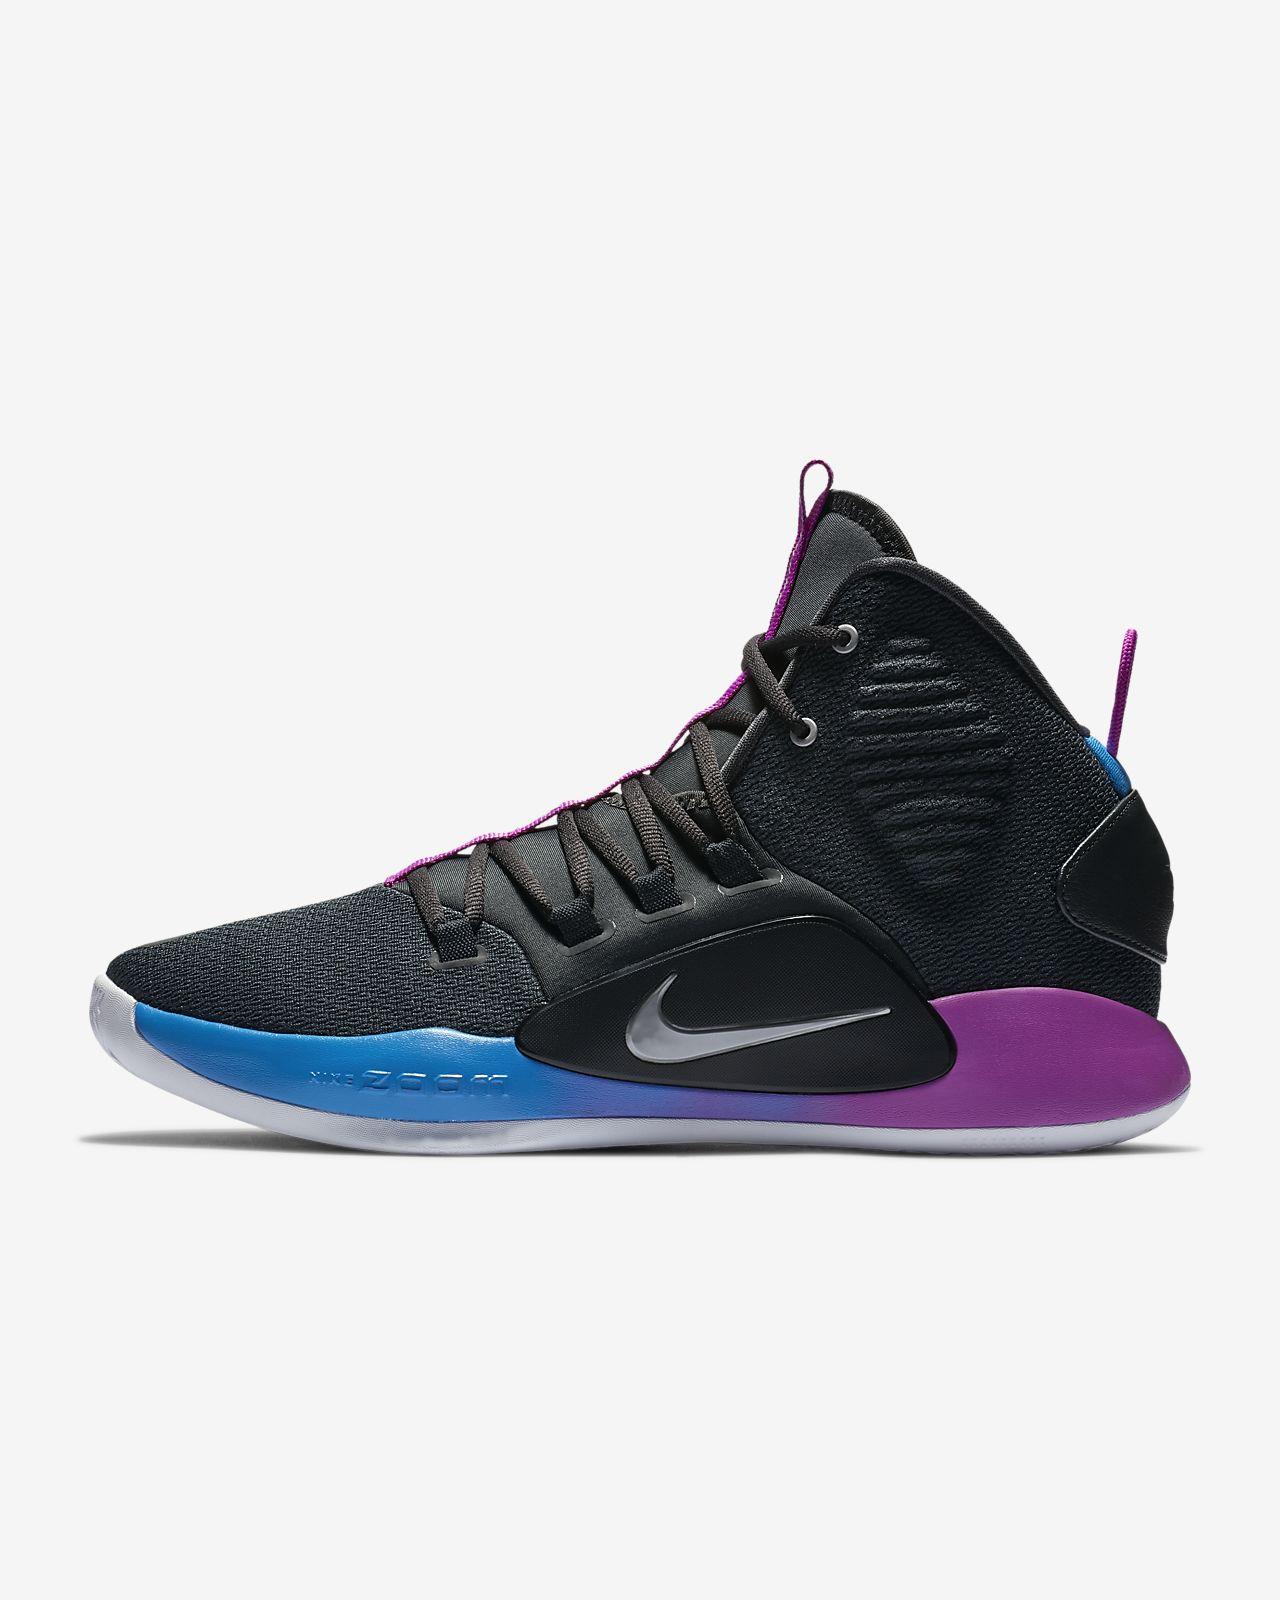 reputable site 37415 123e1 Basketball Shoe. Nike Hyperdunk X